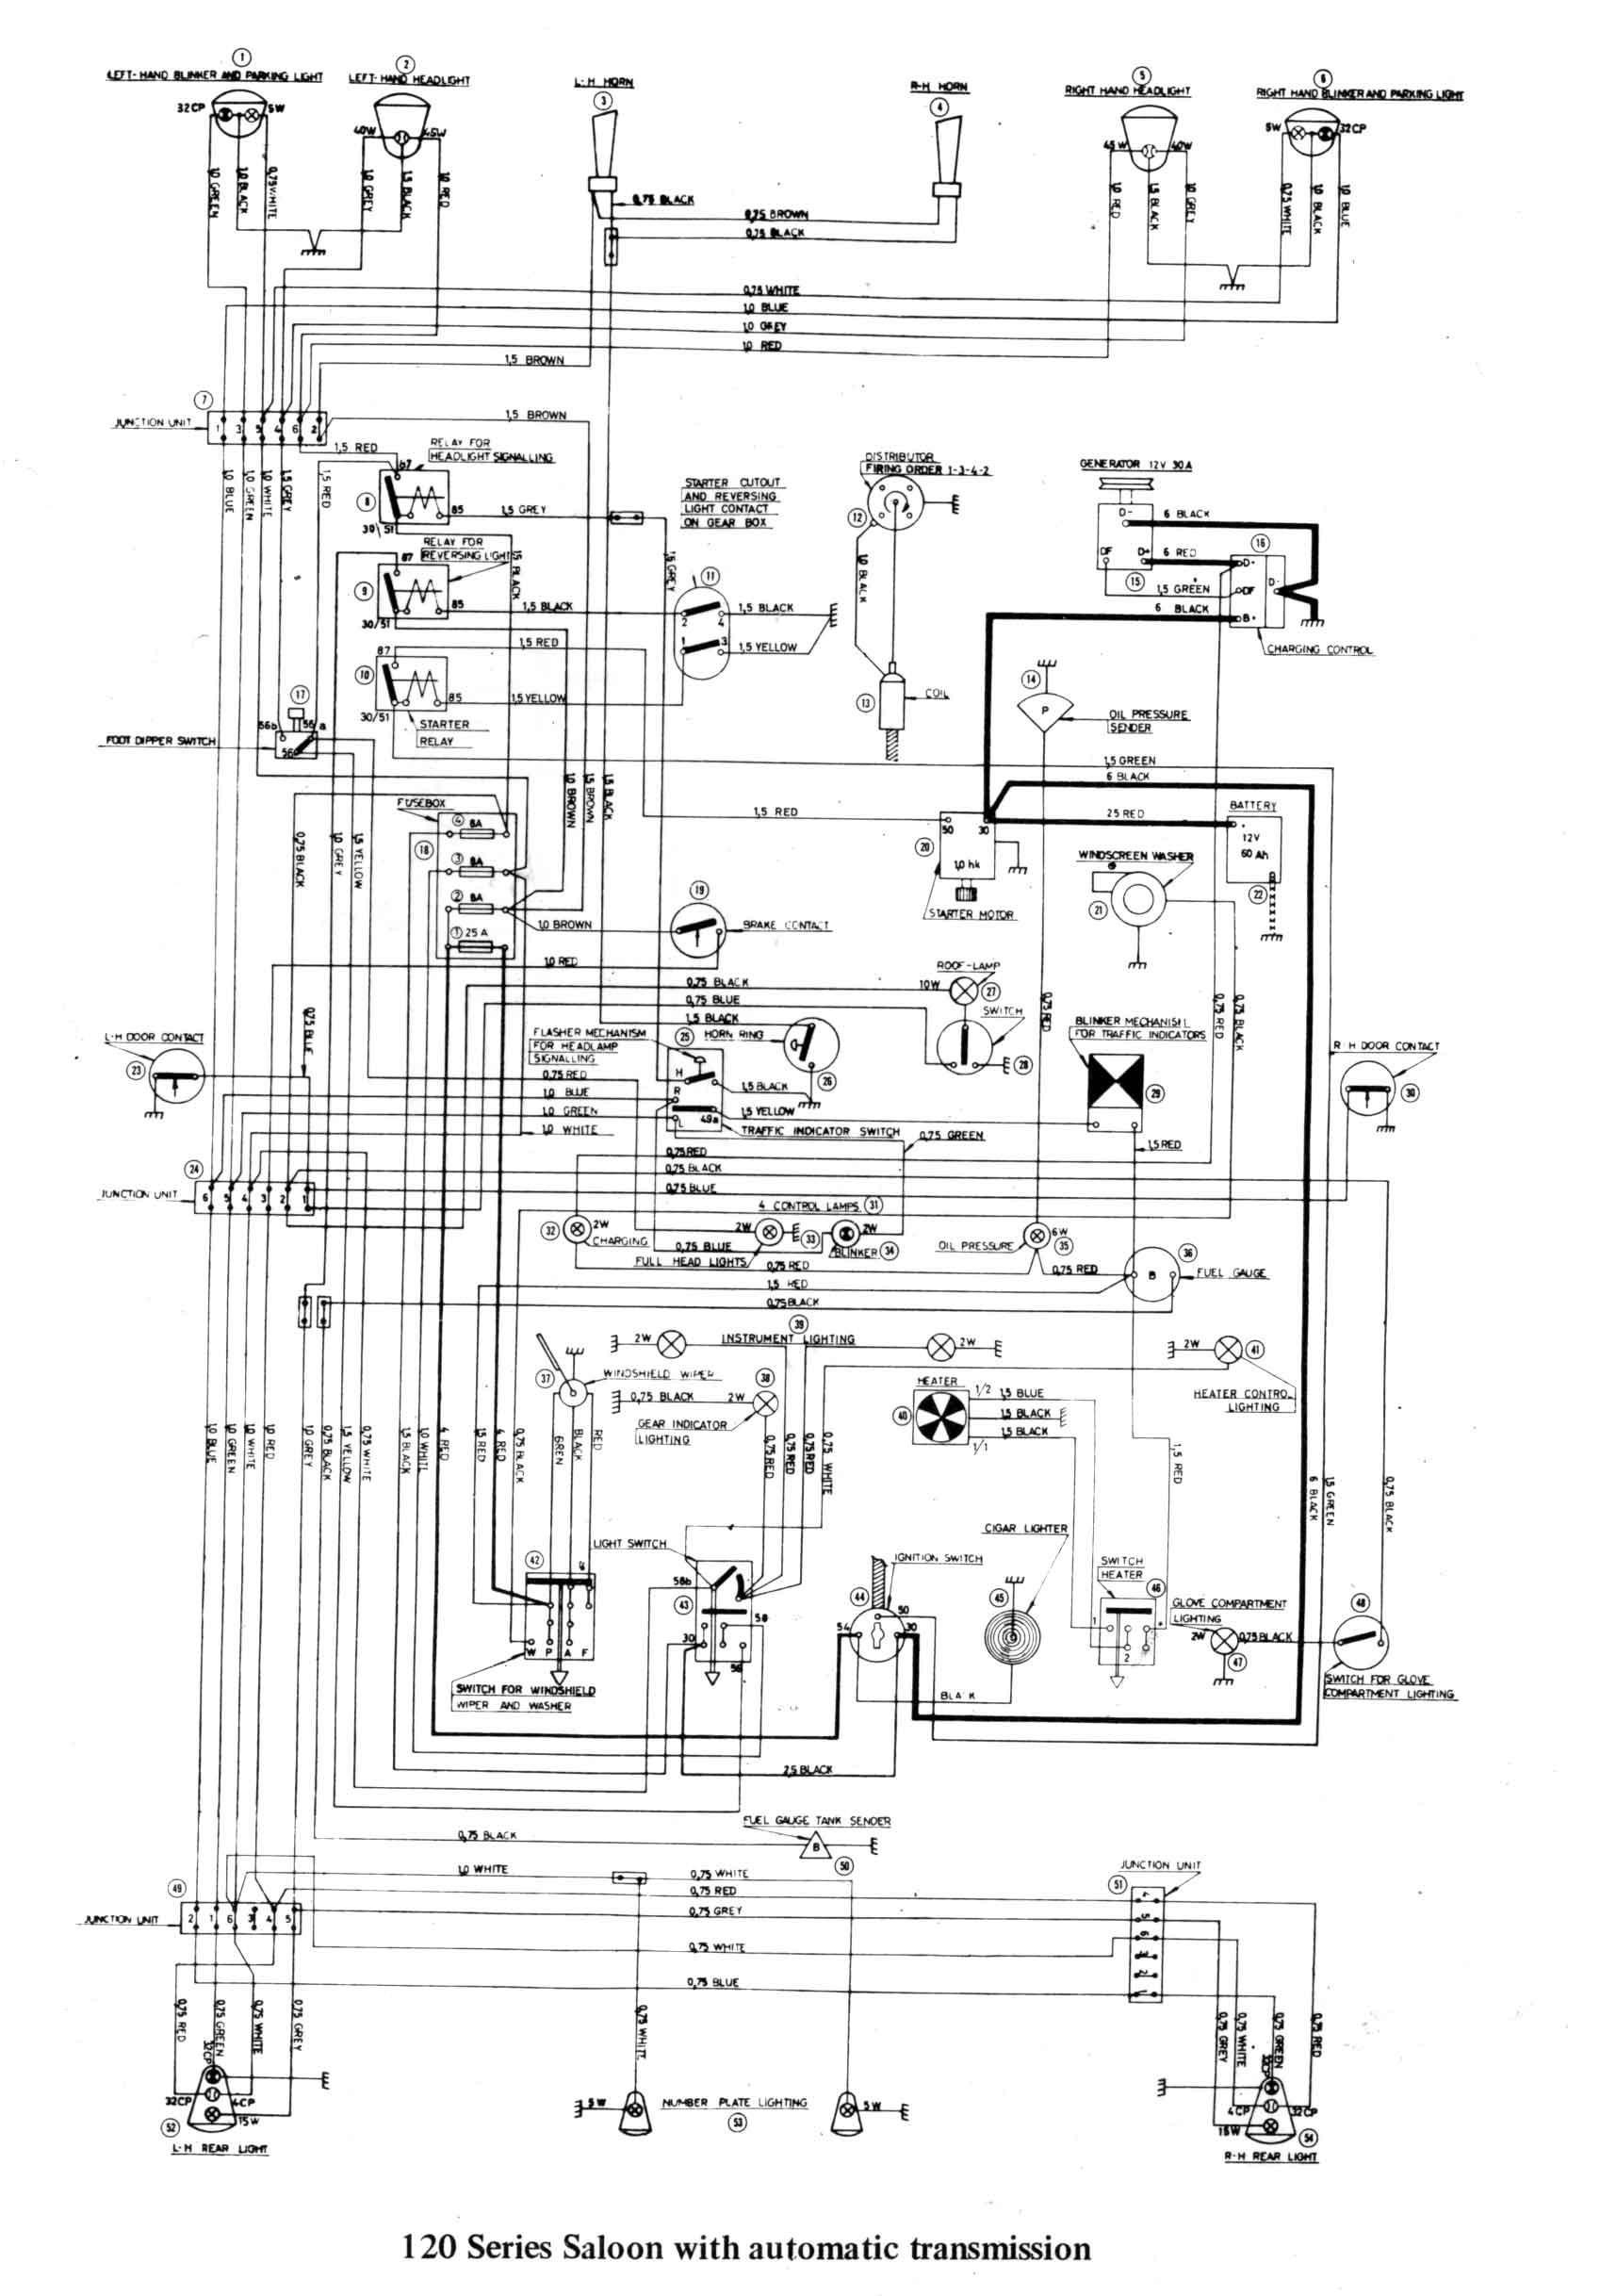 hight resolution of yamaha golf cart battery wiring diagram wiring diagrams for yamaha golf carts valid ezgo wiring